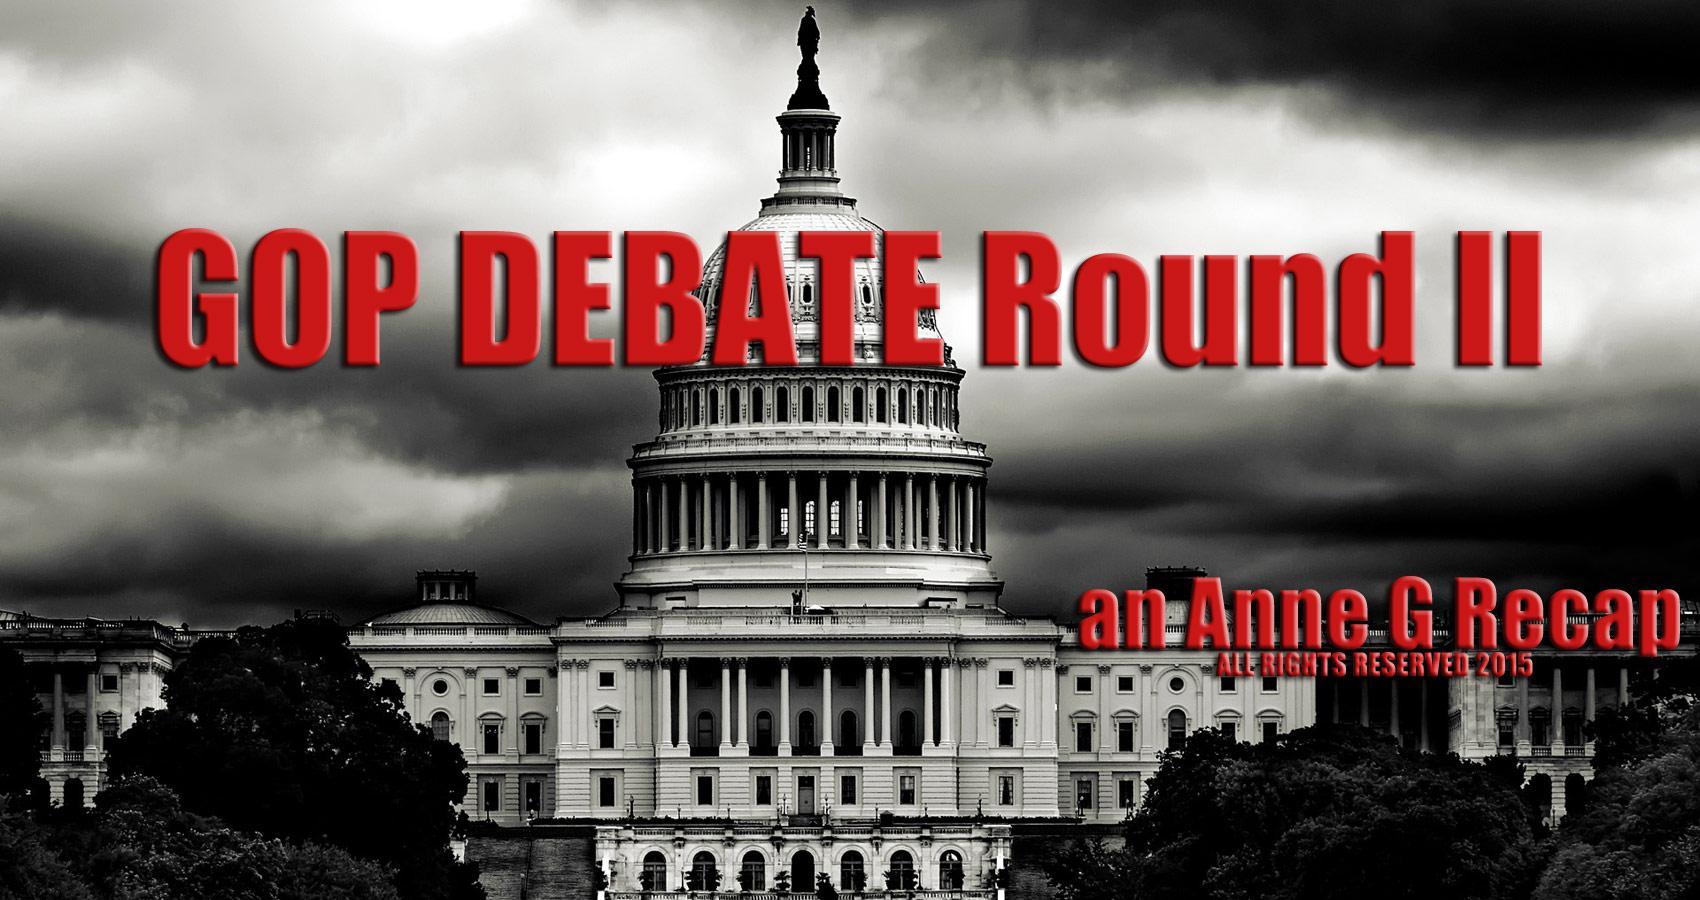 GOP Debate Round II The Recap at spillwords.com by Anne G